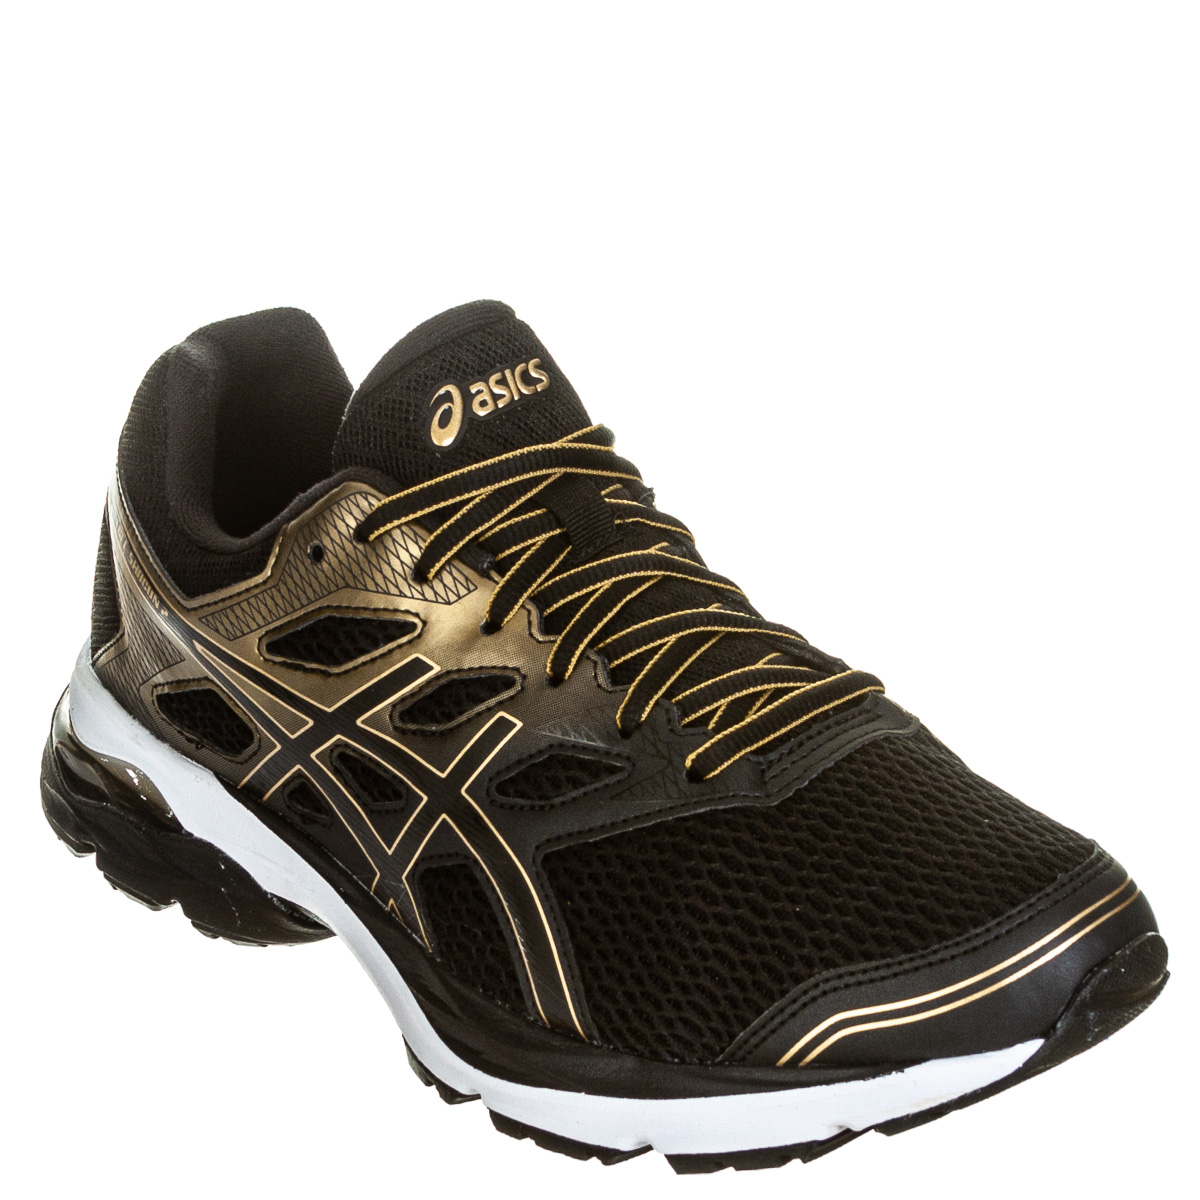 Tênis Asics Gel Shogun 2 Masculino Corrida - Caminhada - Preto/Dourado